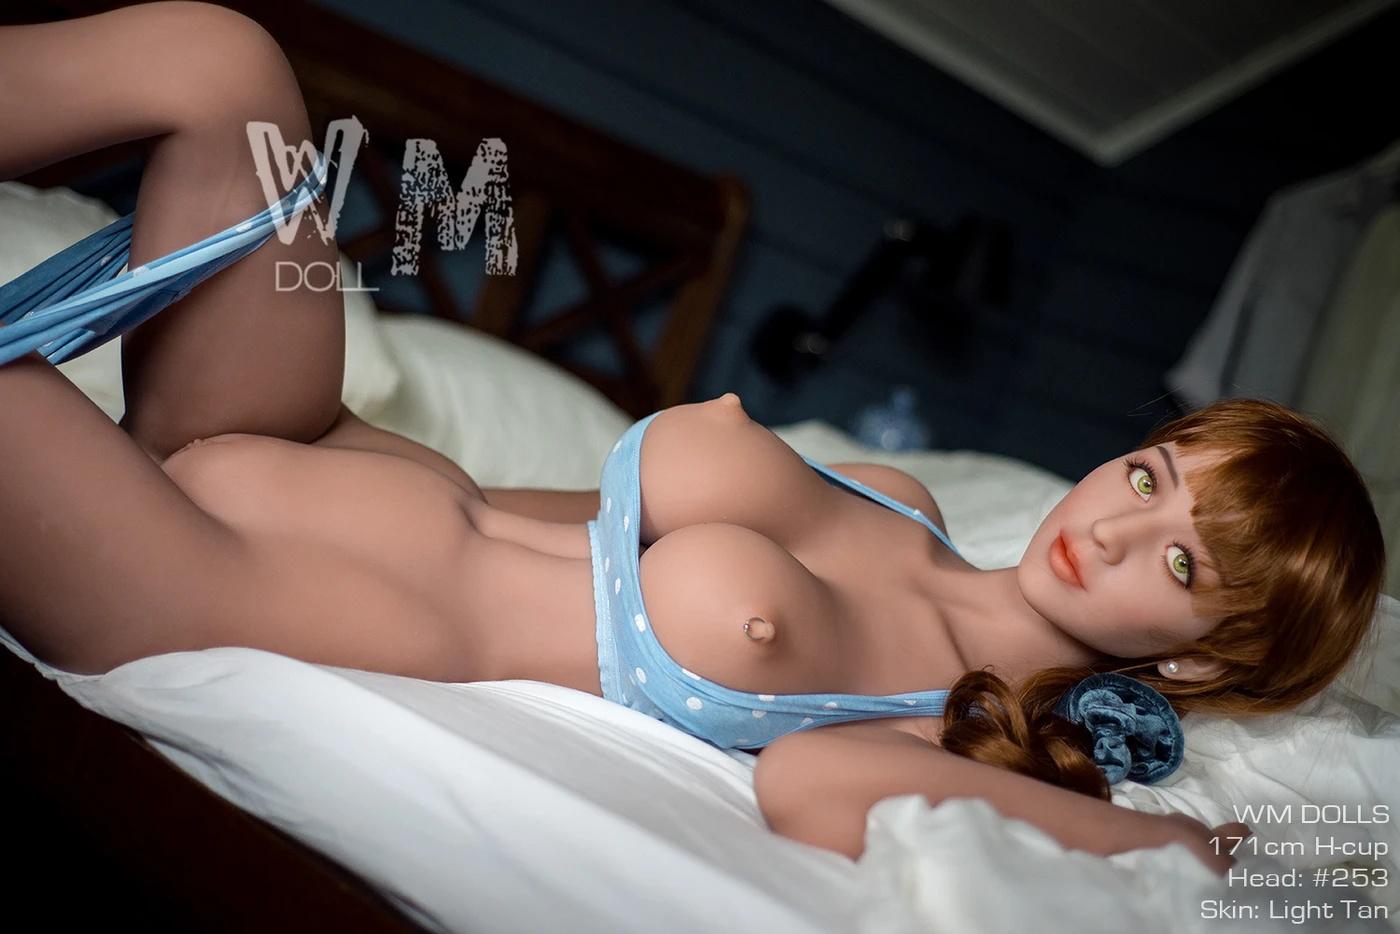 Sexdollie-171cm-sex-doll-17100320